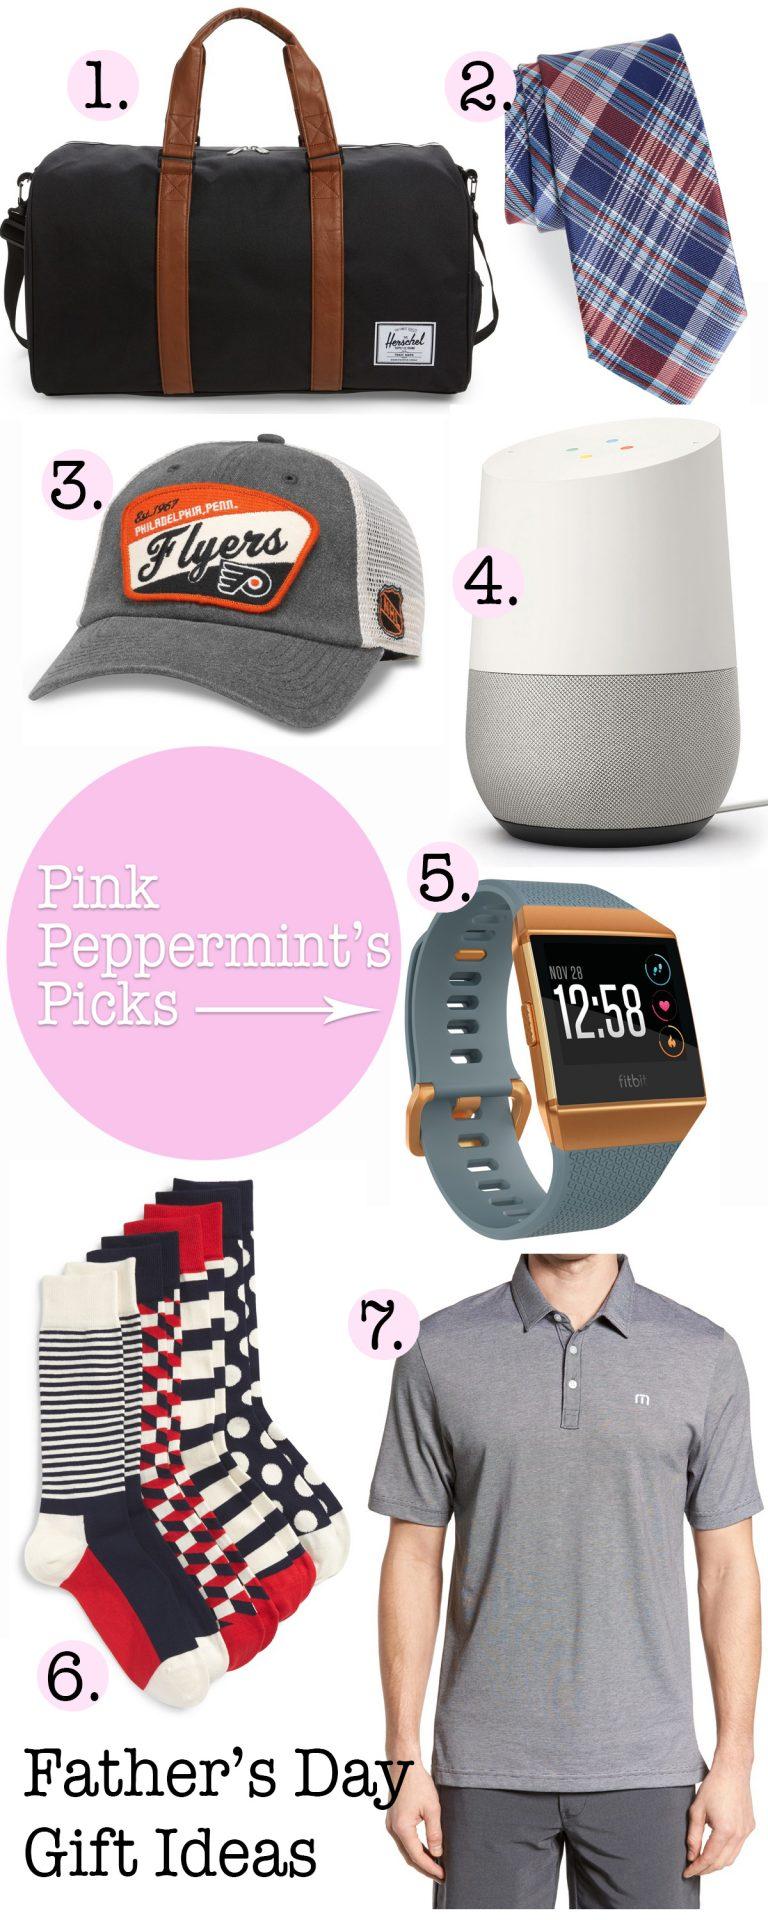 Pink peppermints picks june 6th